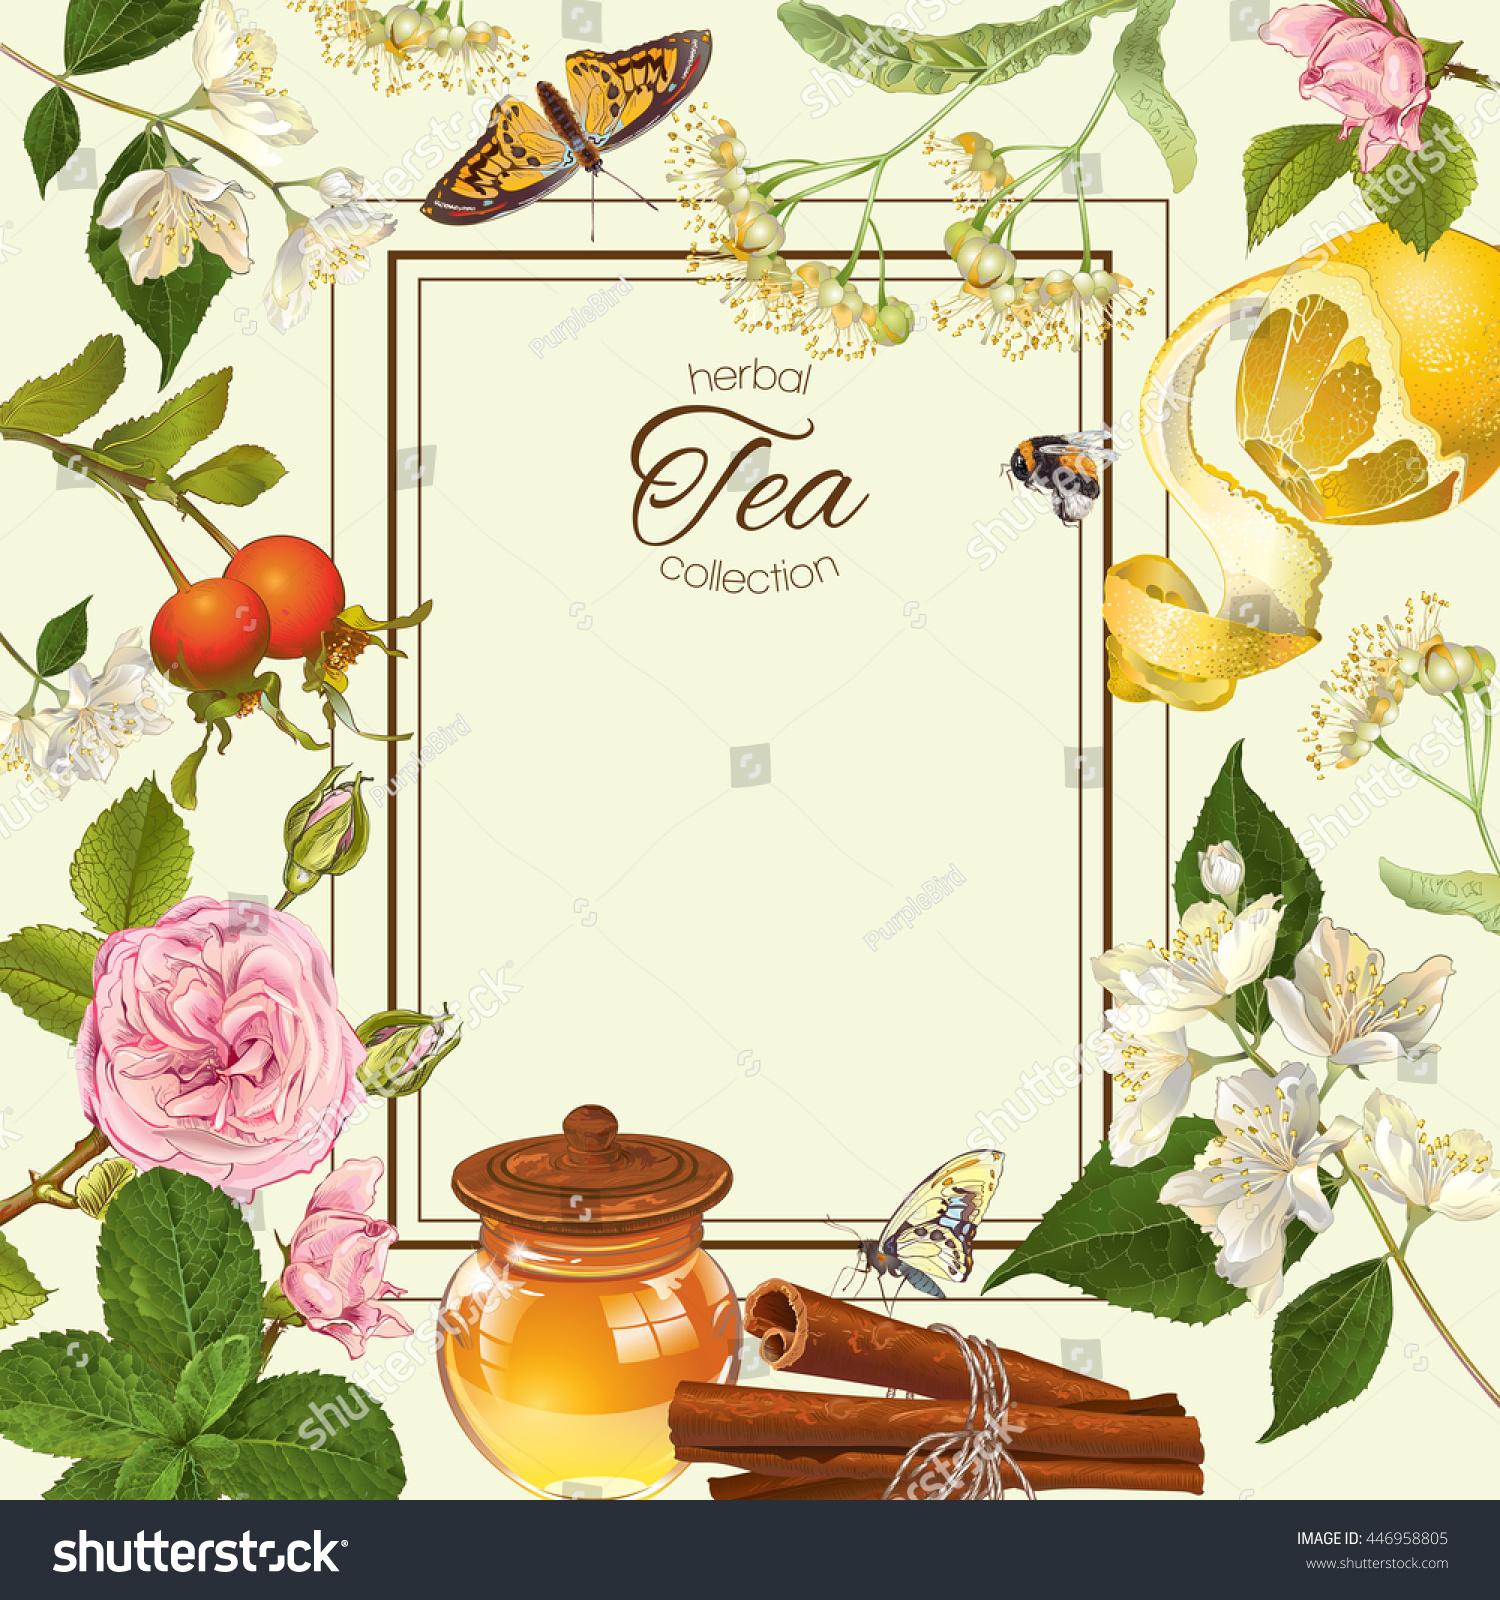 Herbal tea frame linden jasmine flowers stock illustration 446958805 herbal tea frame with linden and jasmine flowers lemon and honey design for tea izmirmasajfo